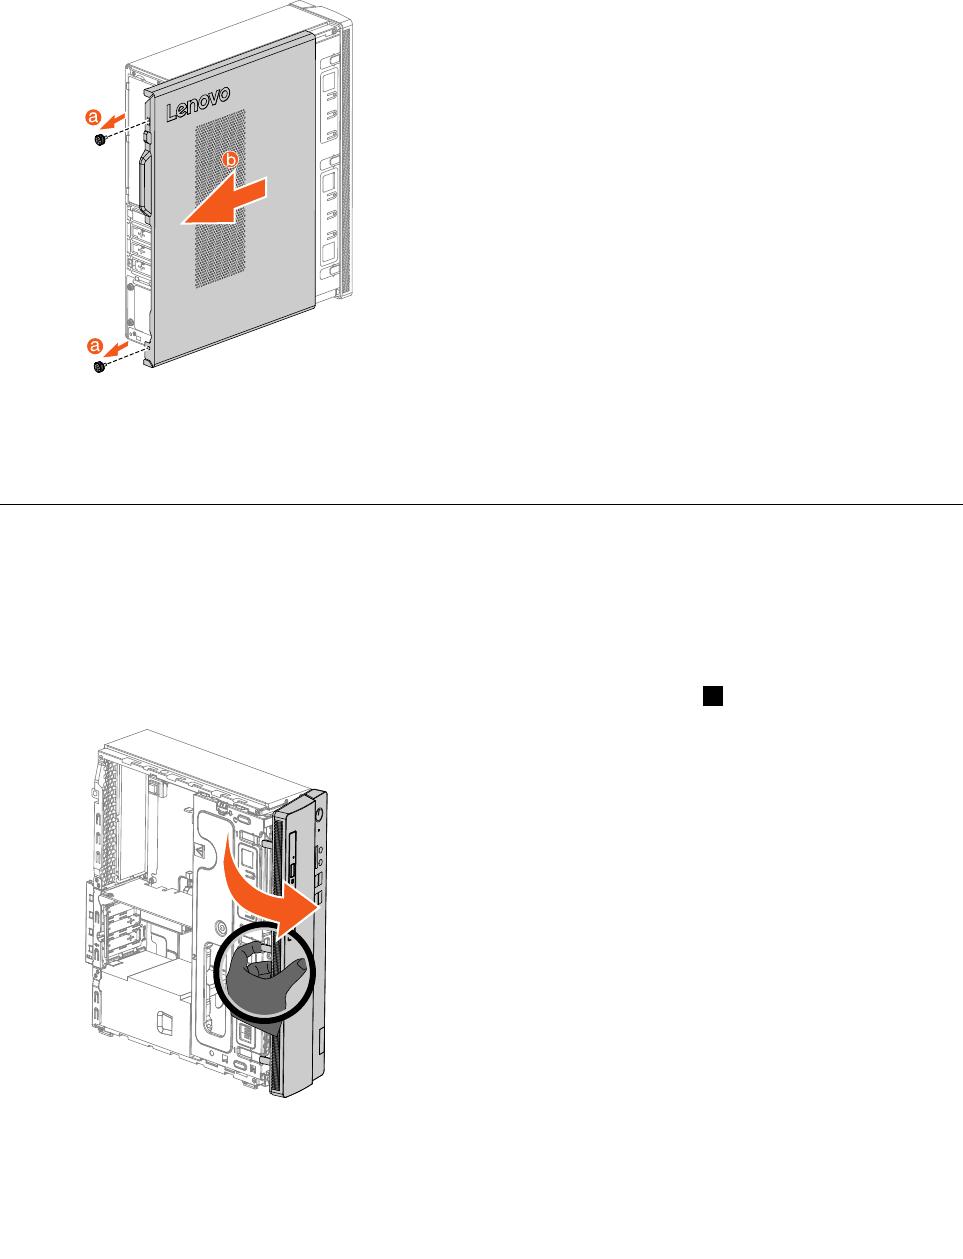 Lenovo 310S Hmm 20170214 User Manual Ideacentre Series